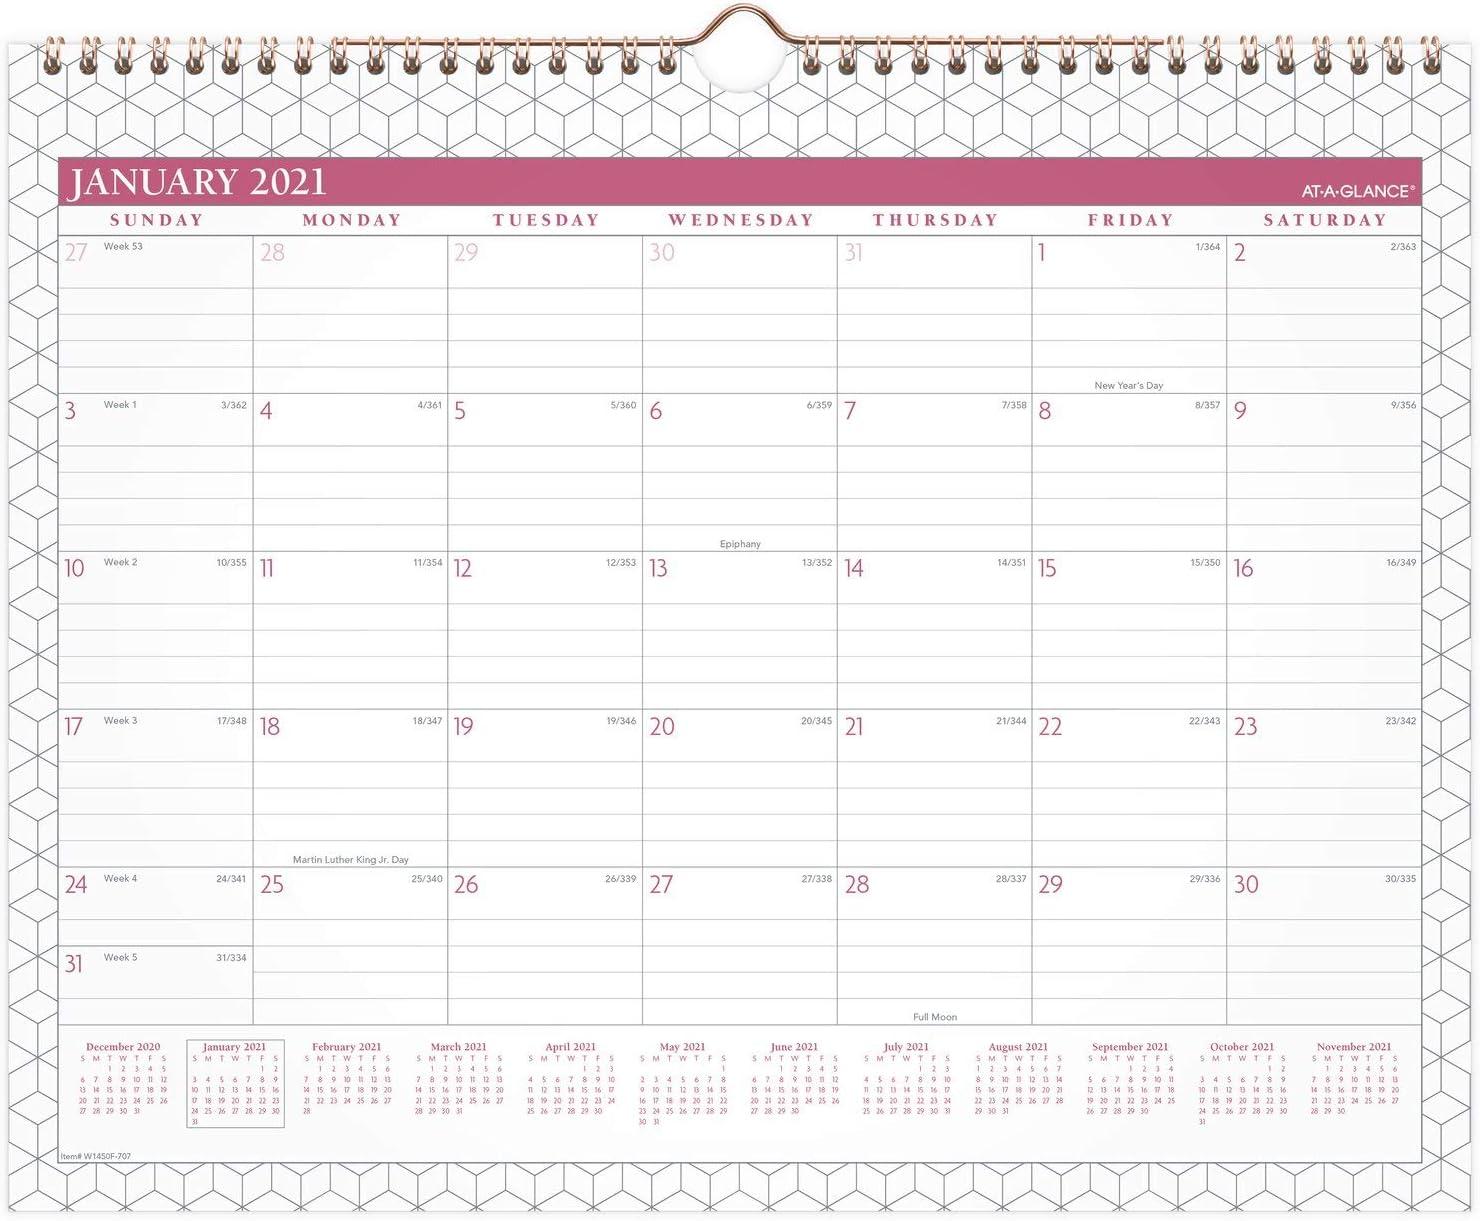 15 x 12 Medium BADGE Geo 2021 Wall Calendar by AT-A-GLANCE Wirebound Monthly W1450F-707-21